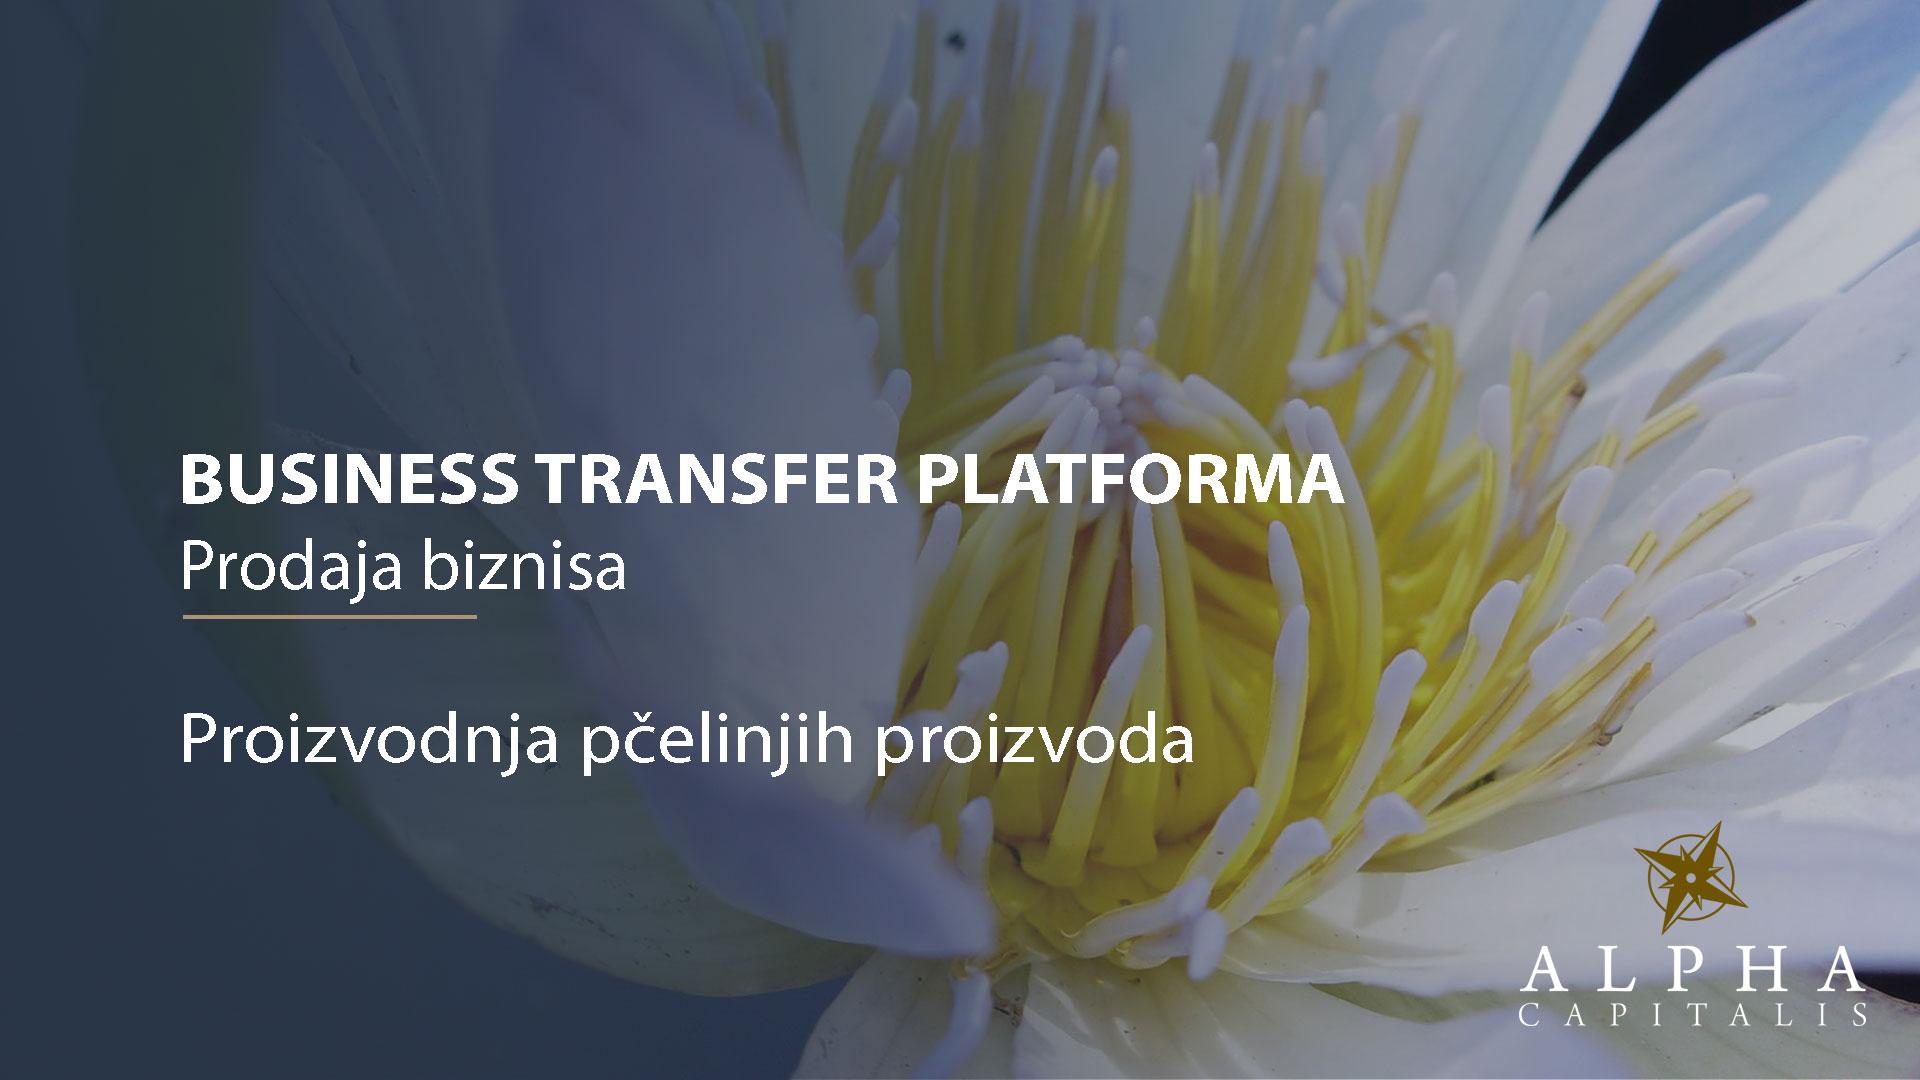 Business-transfer-platforma-prodaja biznisa-pčelarstvo